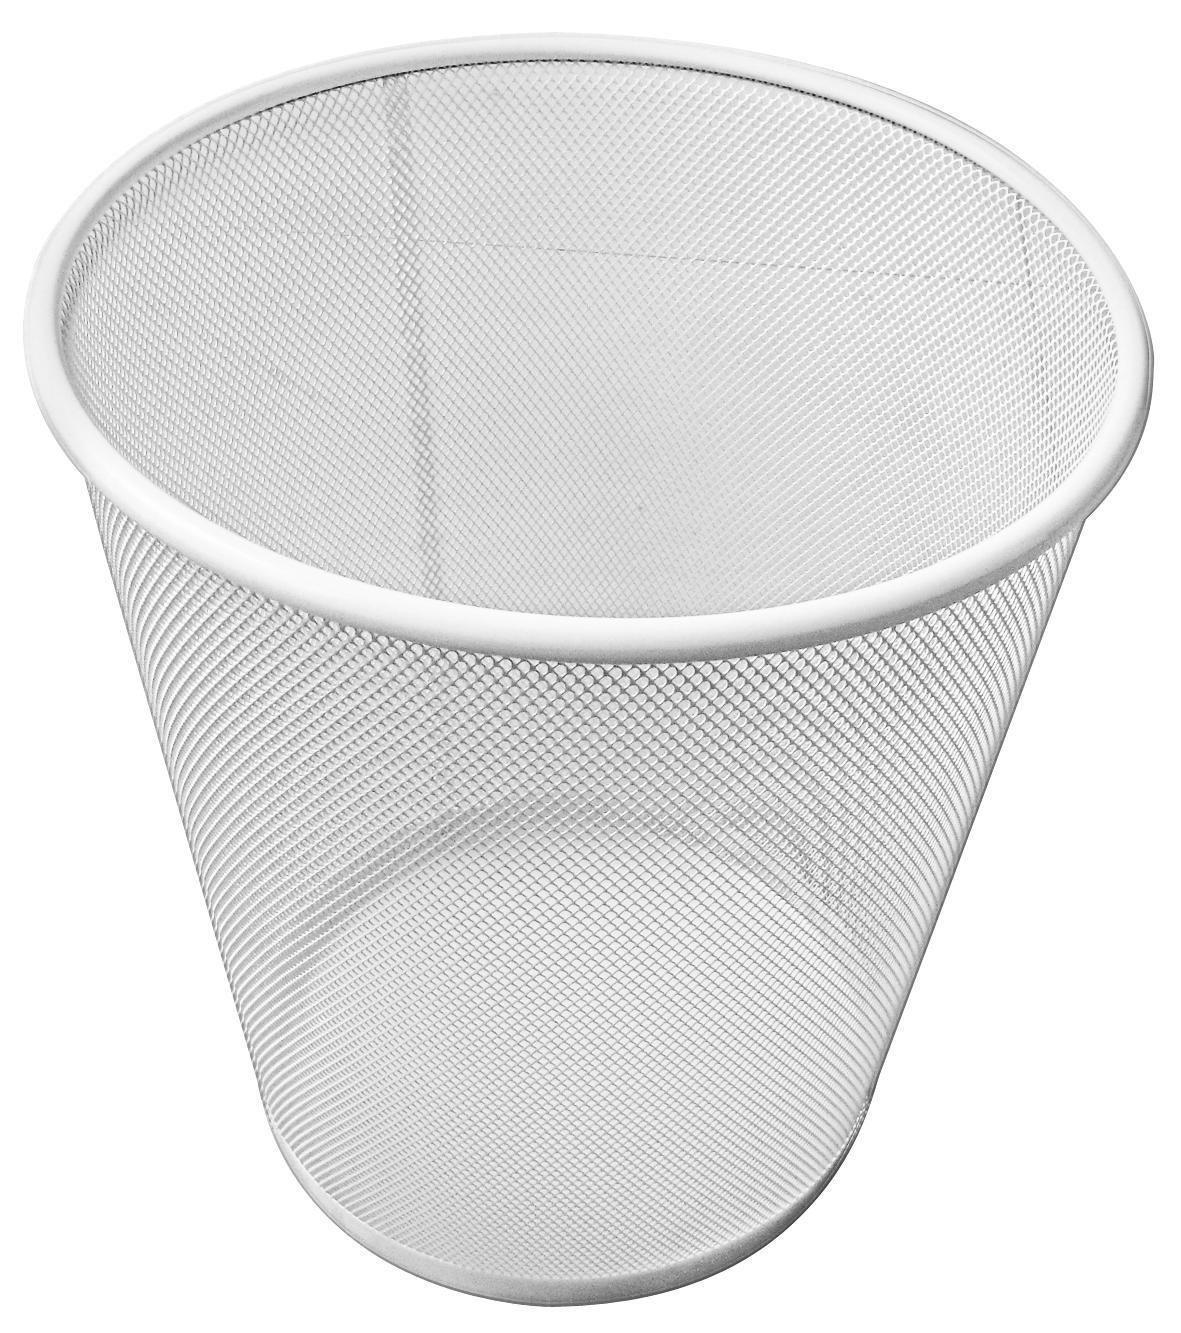 Koš Na Papír Mesh - bílá, Moderní, kov (30,5/34,5cm)